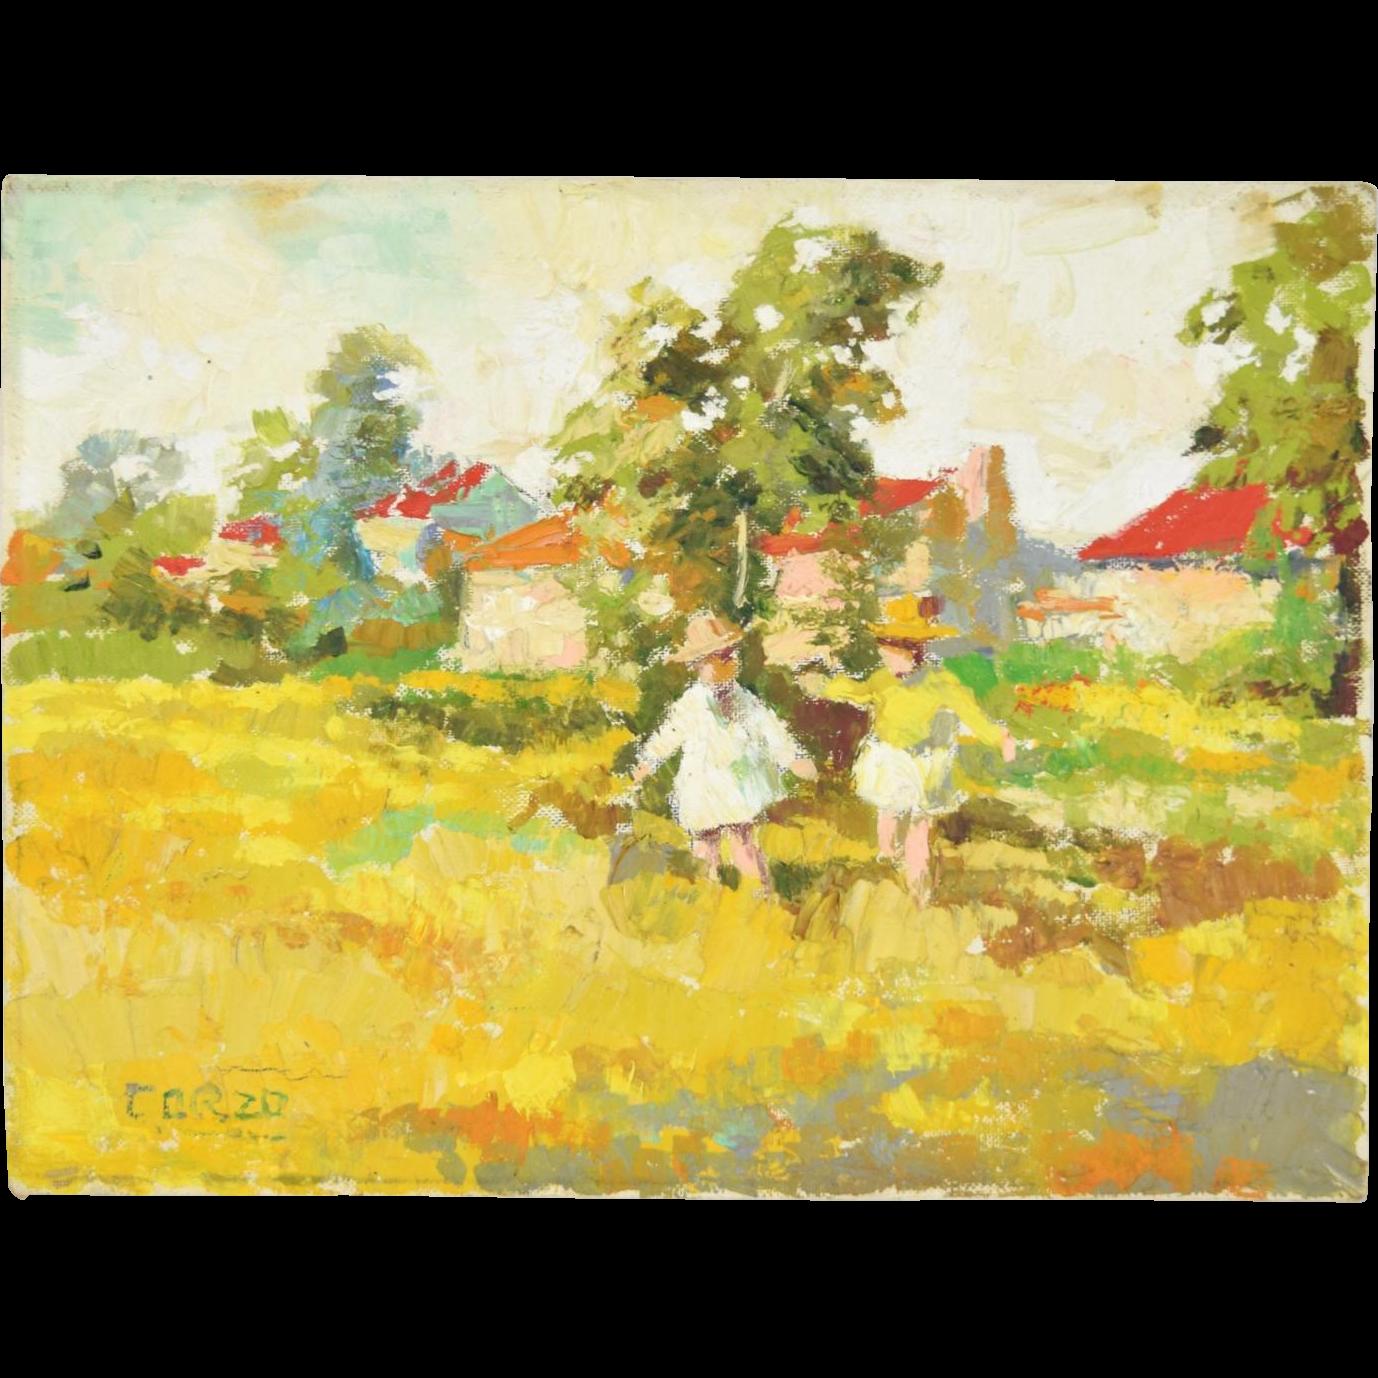 """Sunday Dress"" Impressionist Oil Painting Gracielo Corzo 1970's"